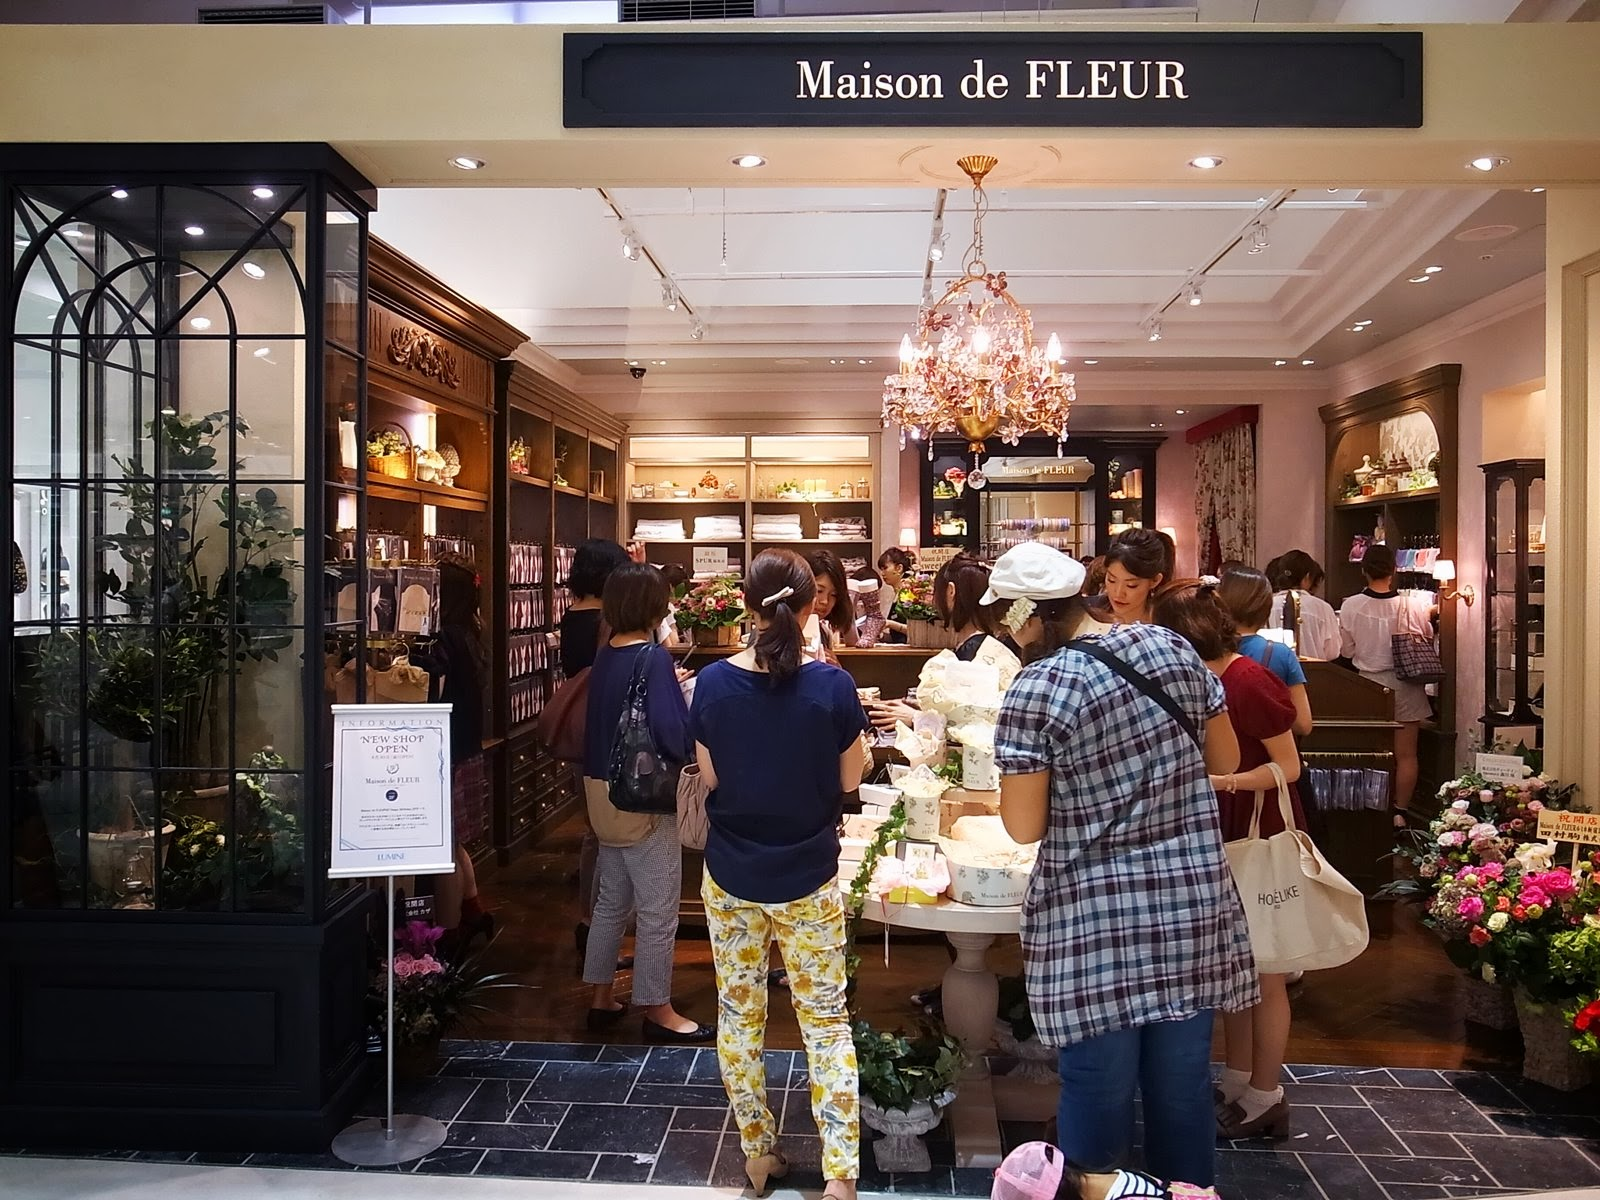 My life with sabon between new york tokyo tel aviv maison de fleur - Maison de tokyo paris ...